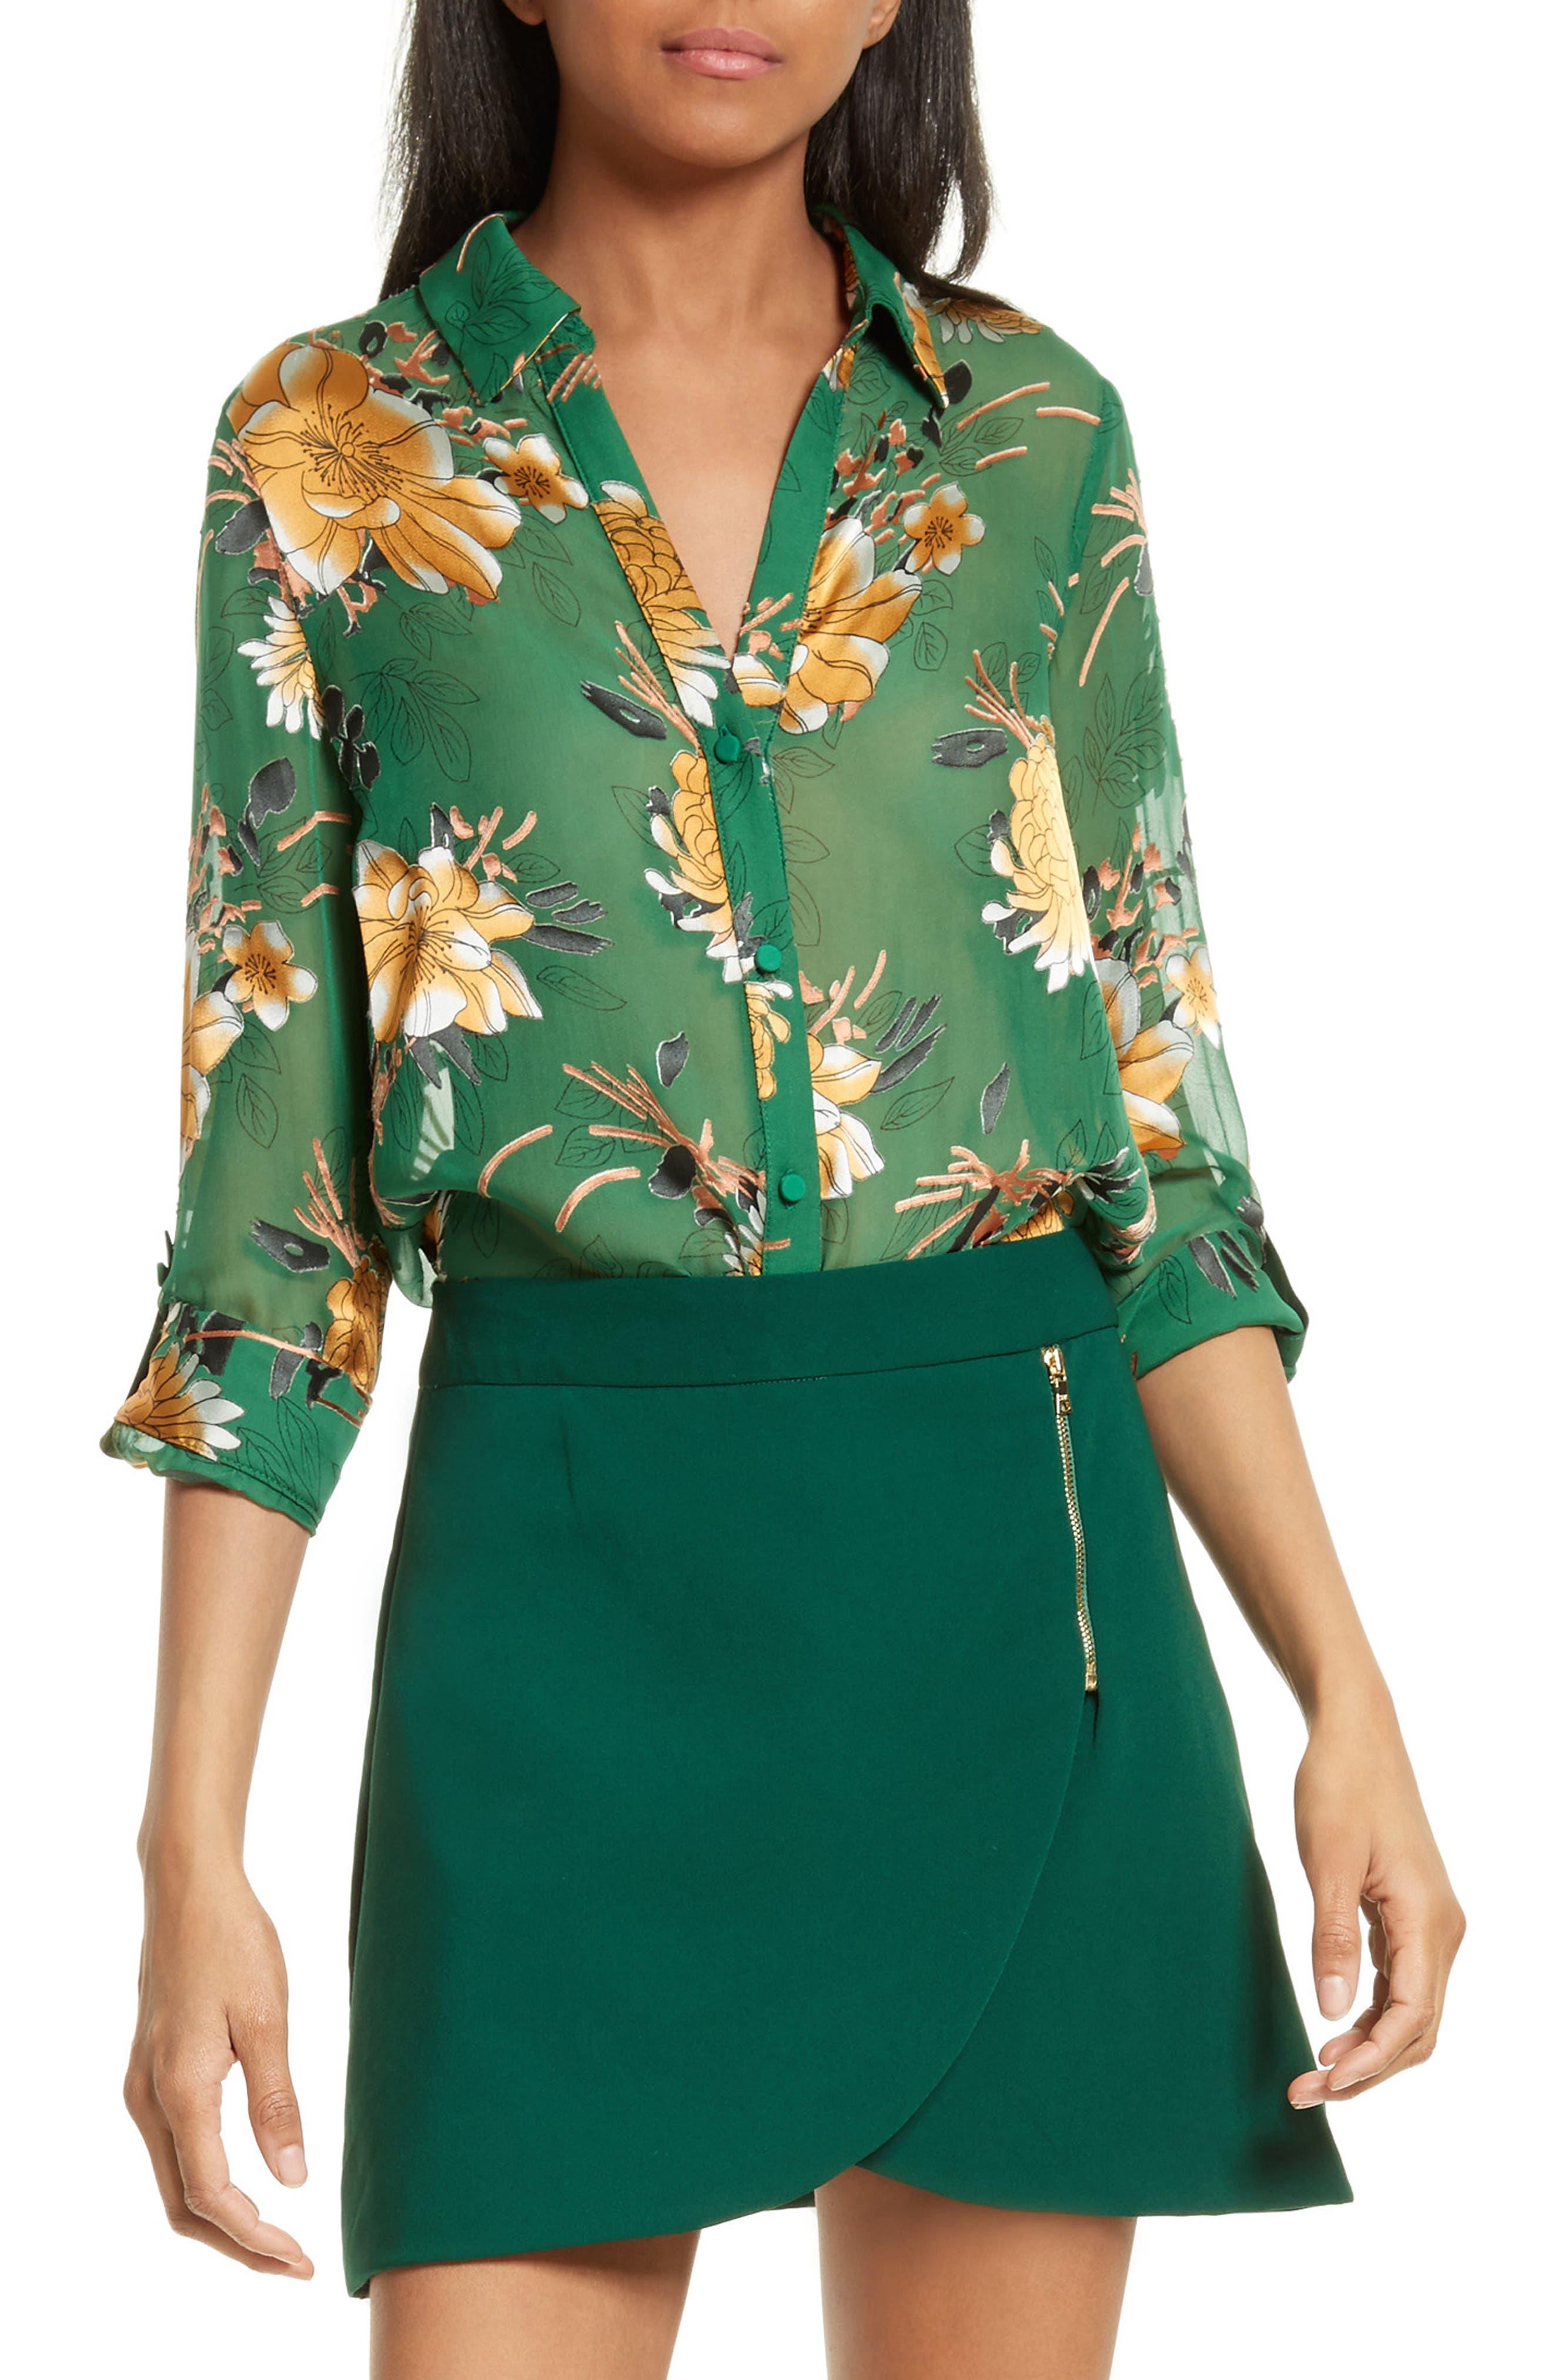 Eloise Roll Sleeve Floral Blouse,                             Main thumbnail 1, color,                             308